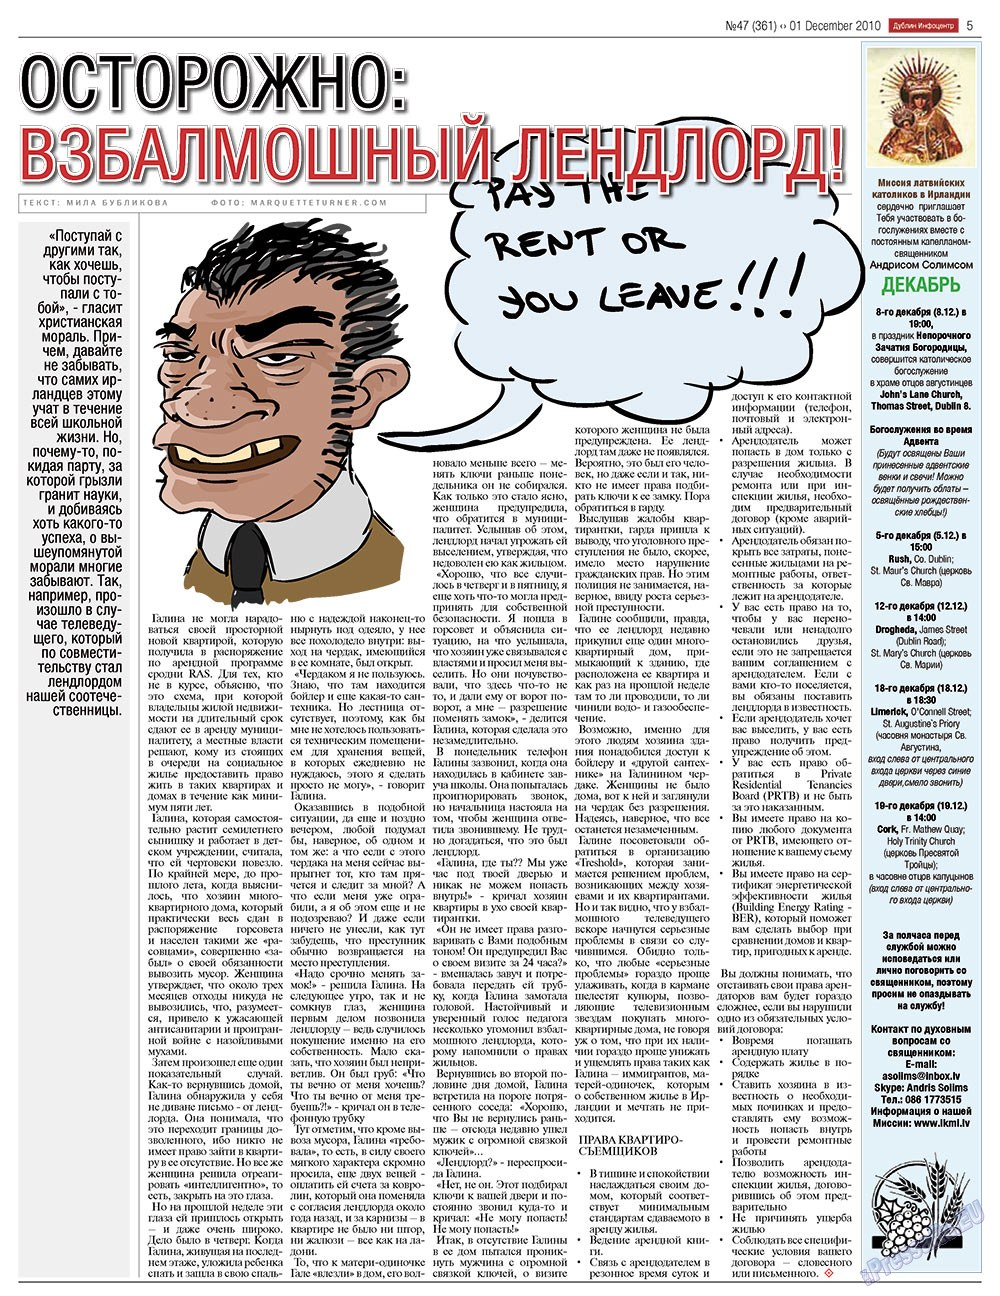 Дублин инфоцентр (газета). 2010 год, номер 47, стр. 5